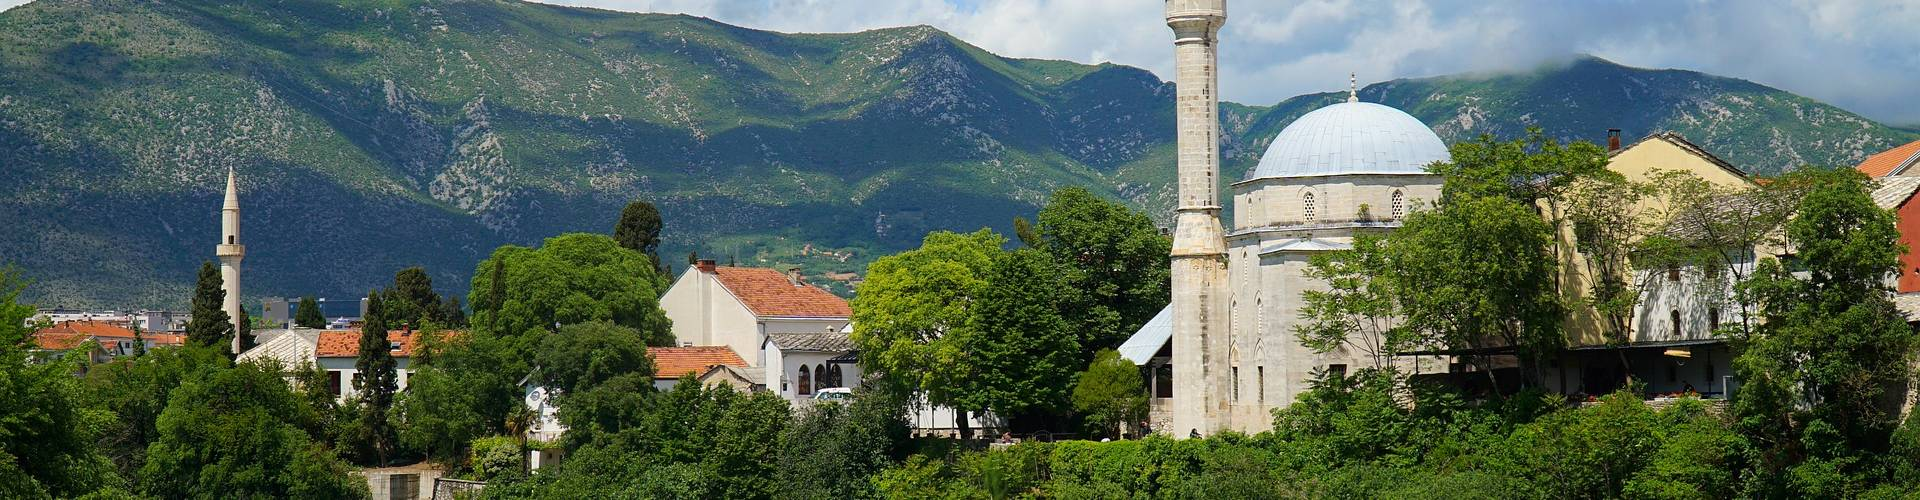 Vikend ture, Bosna i Hercegovina